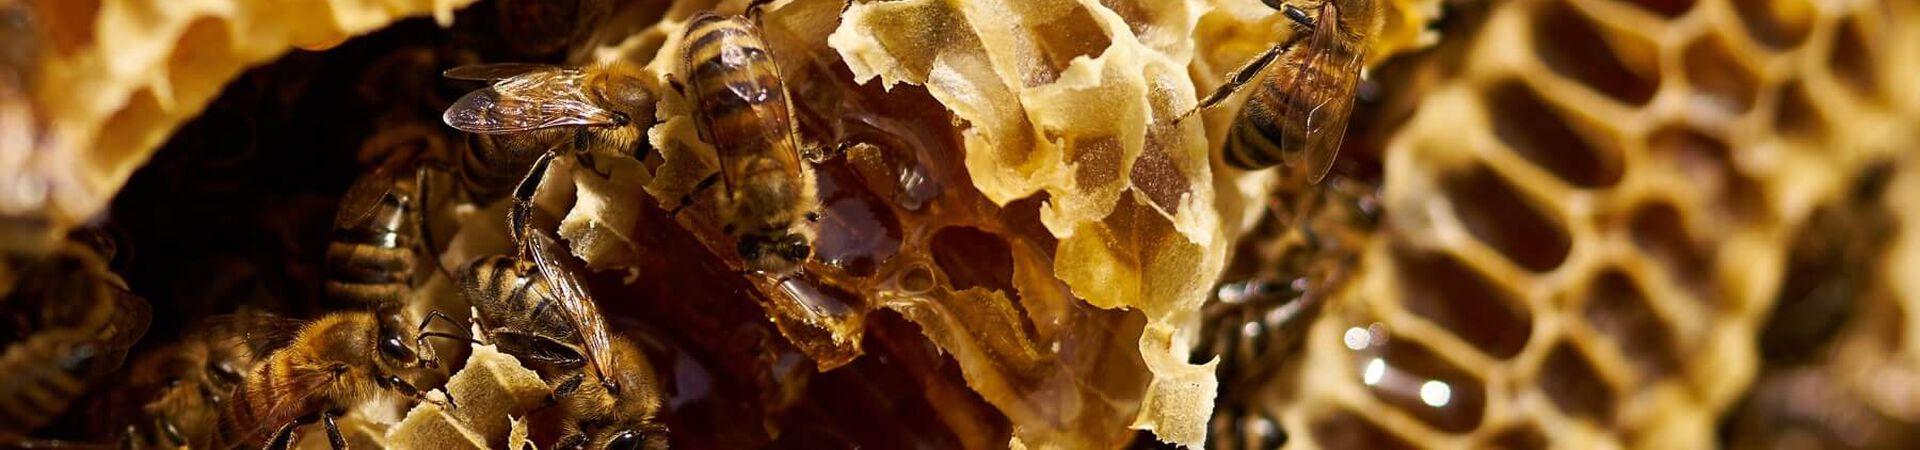 Banner - Honey's Sweet Effects